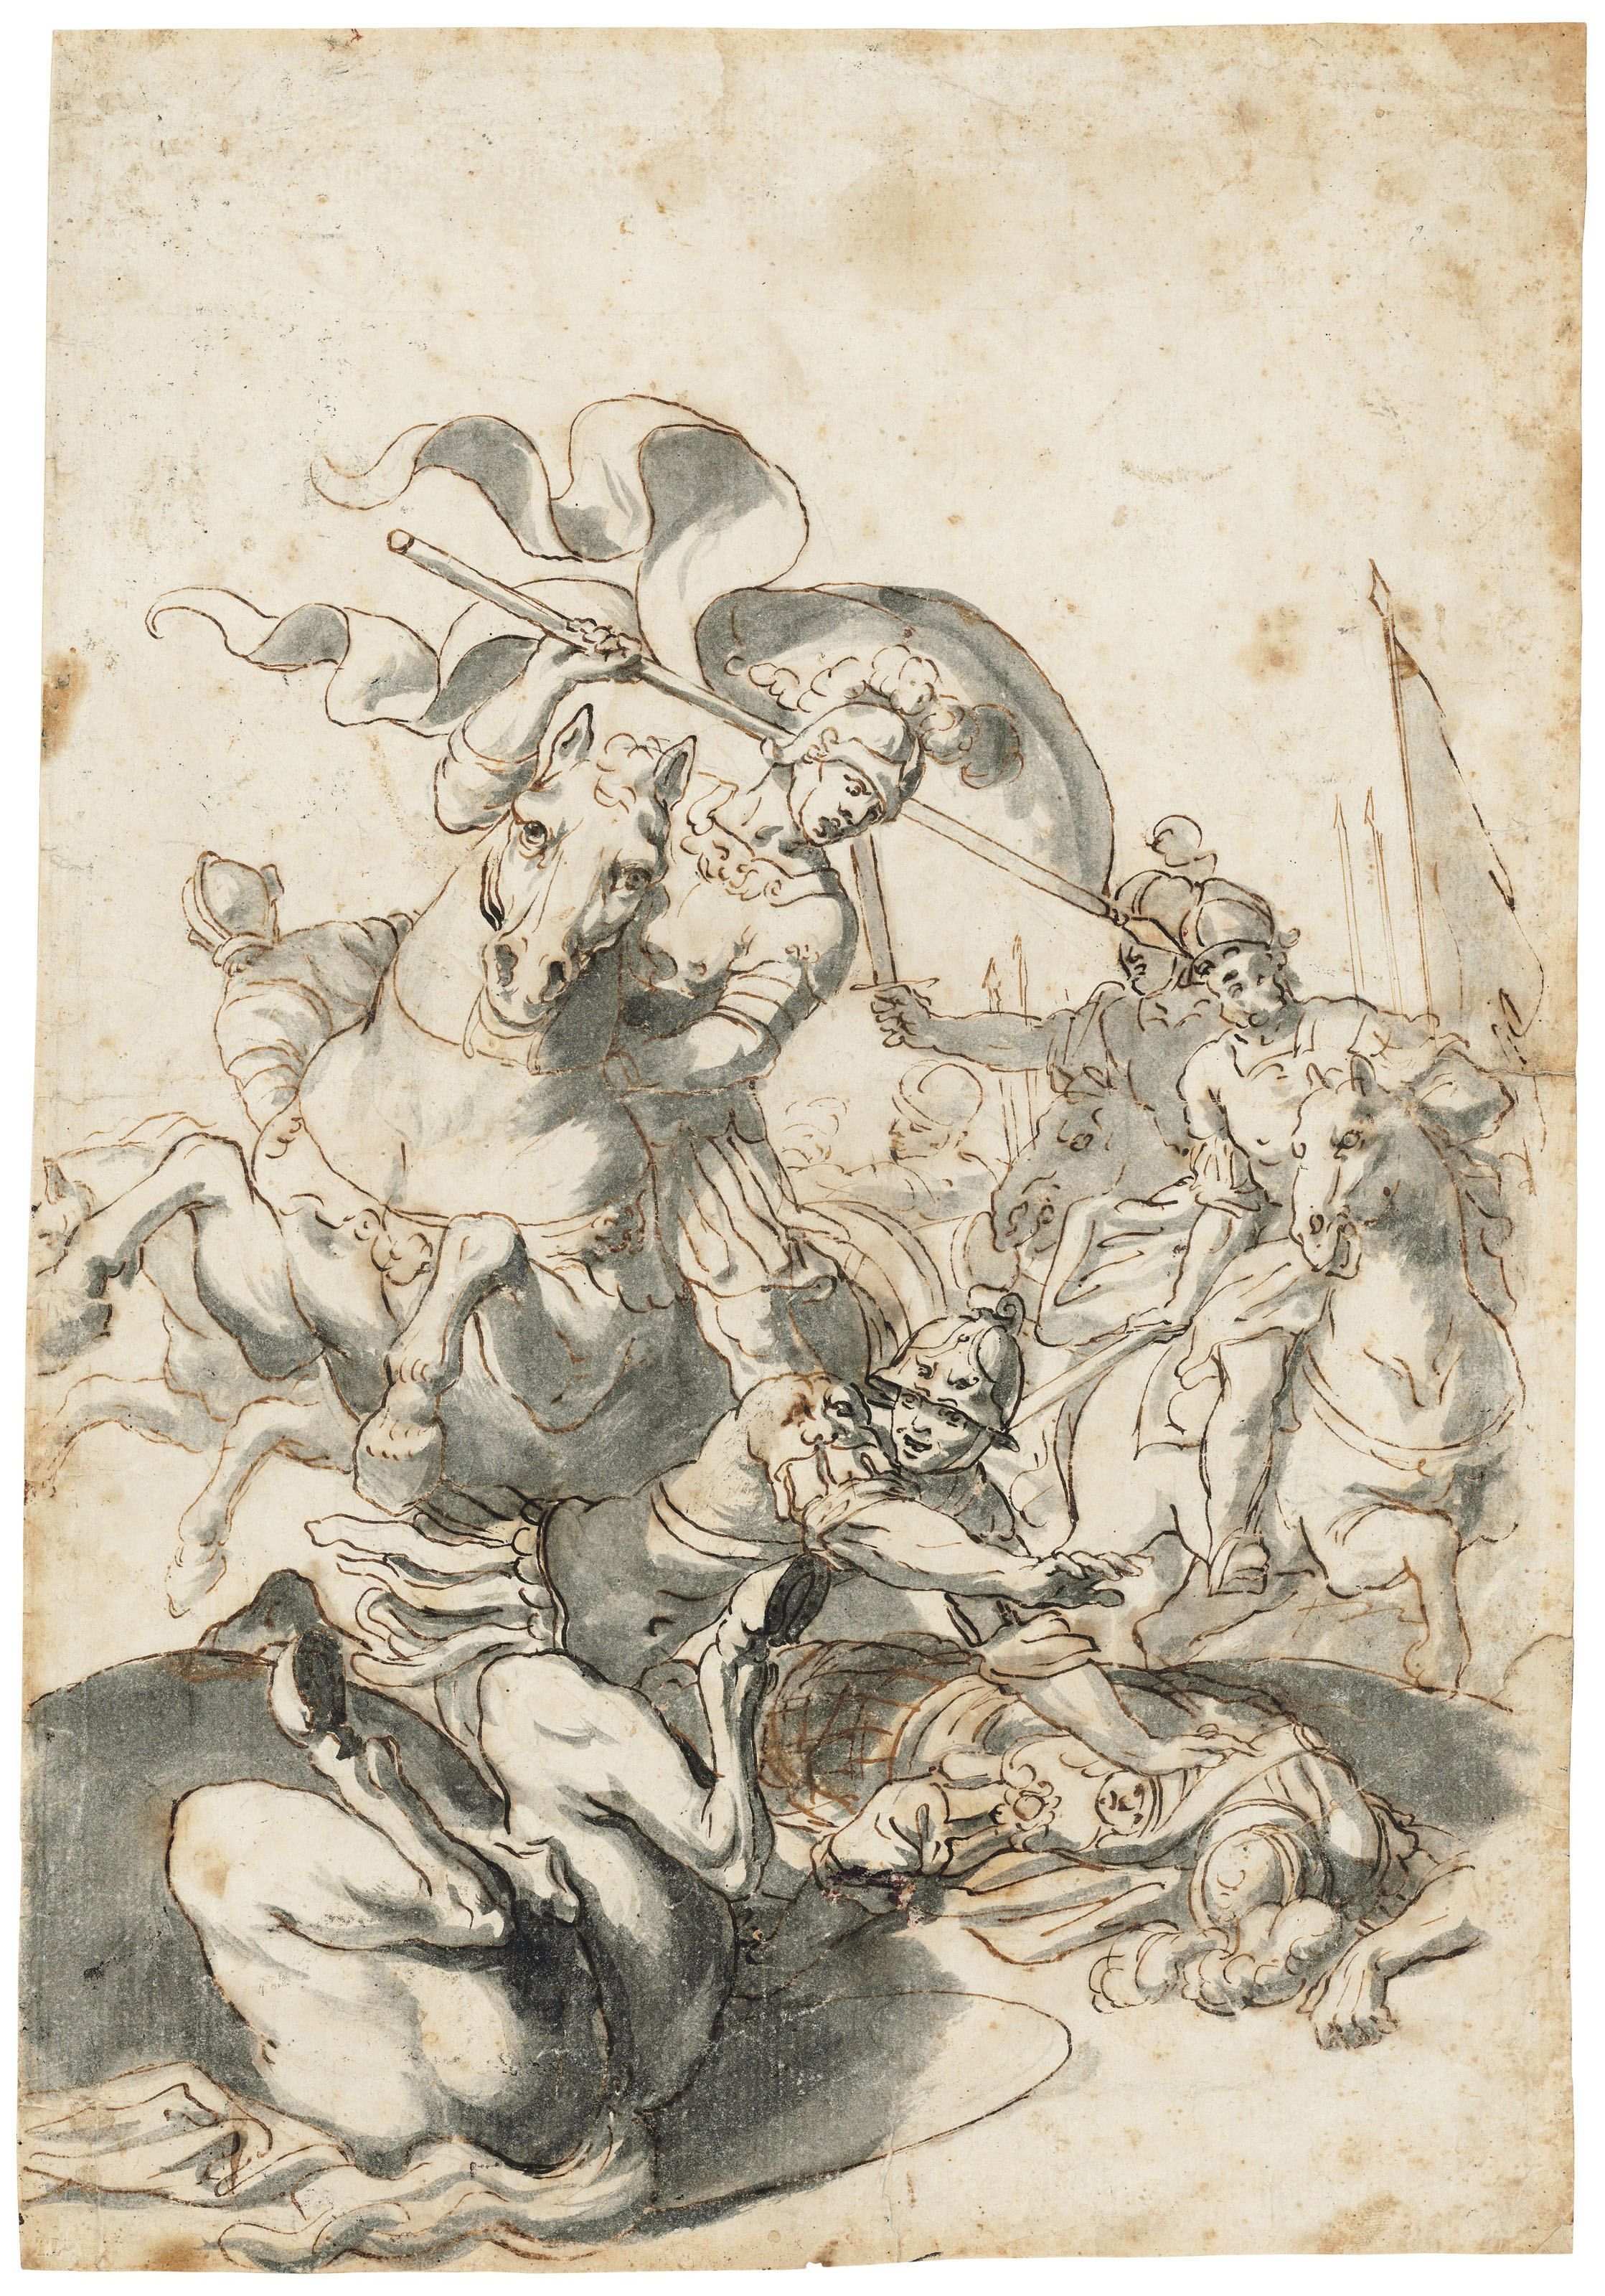 A cavalry encounter